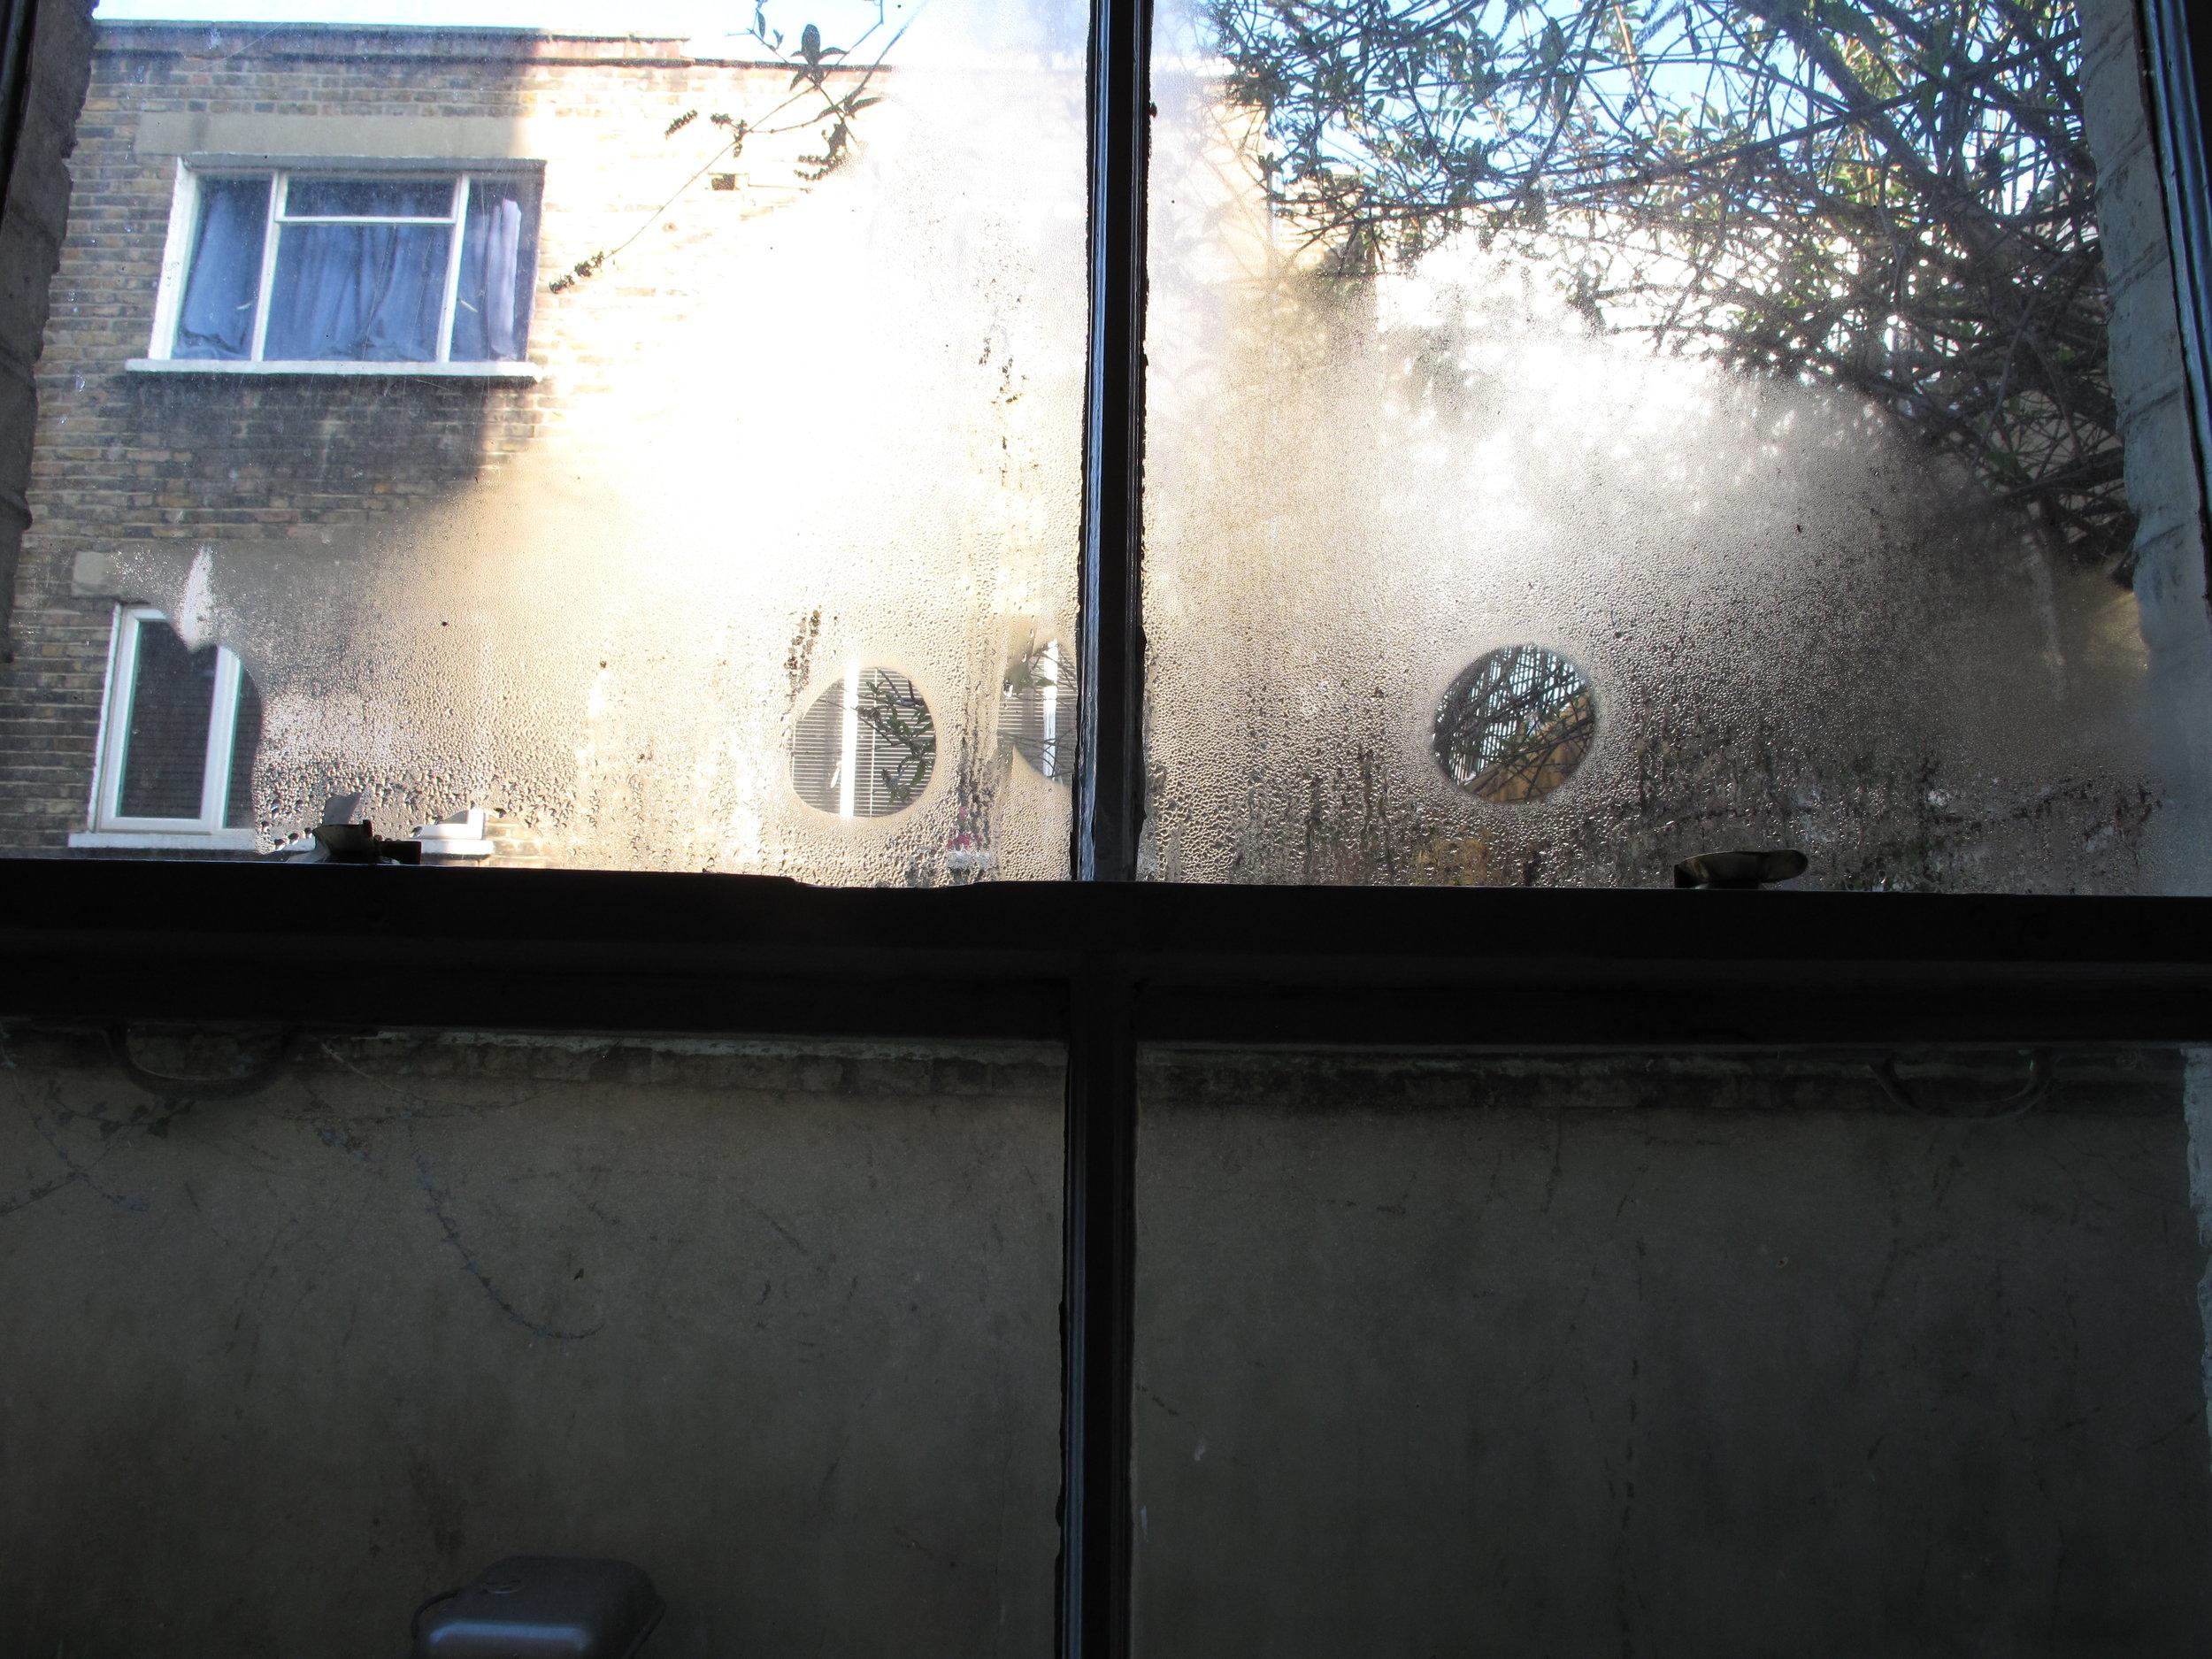 b.Bedroom window, 20 Feb, 09.41am.JPG